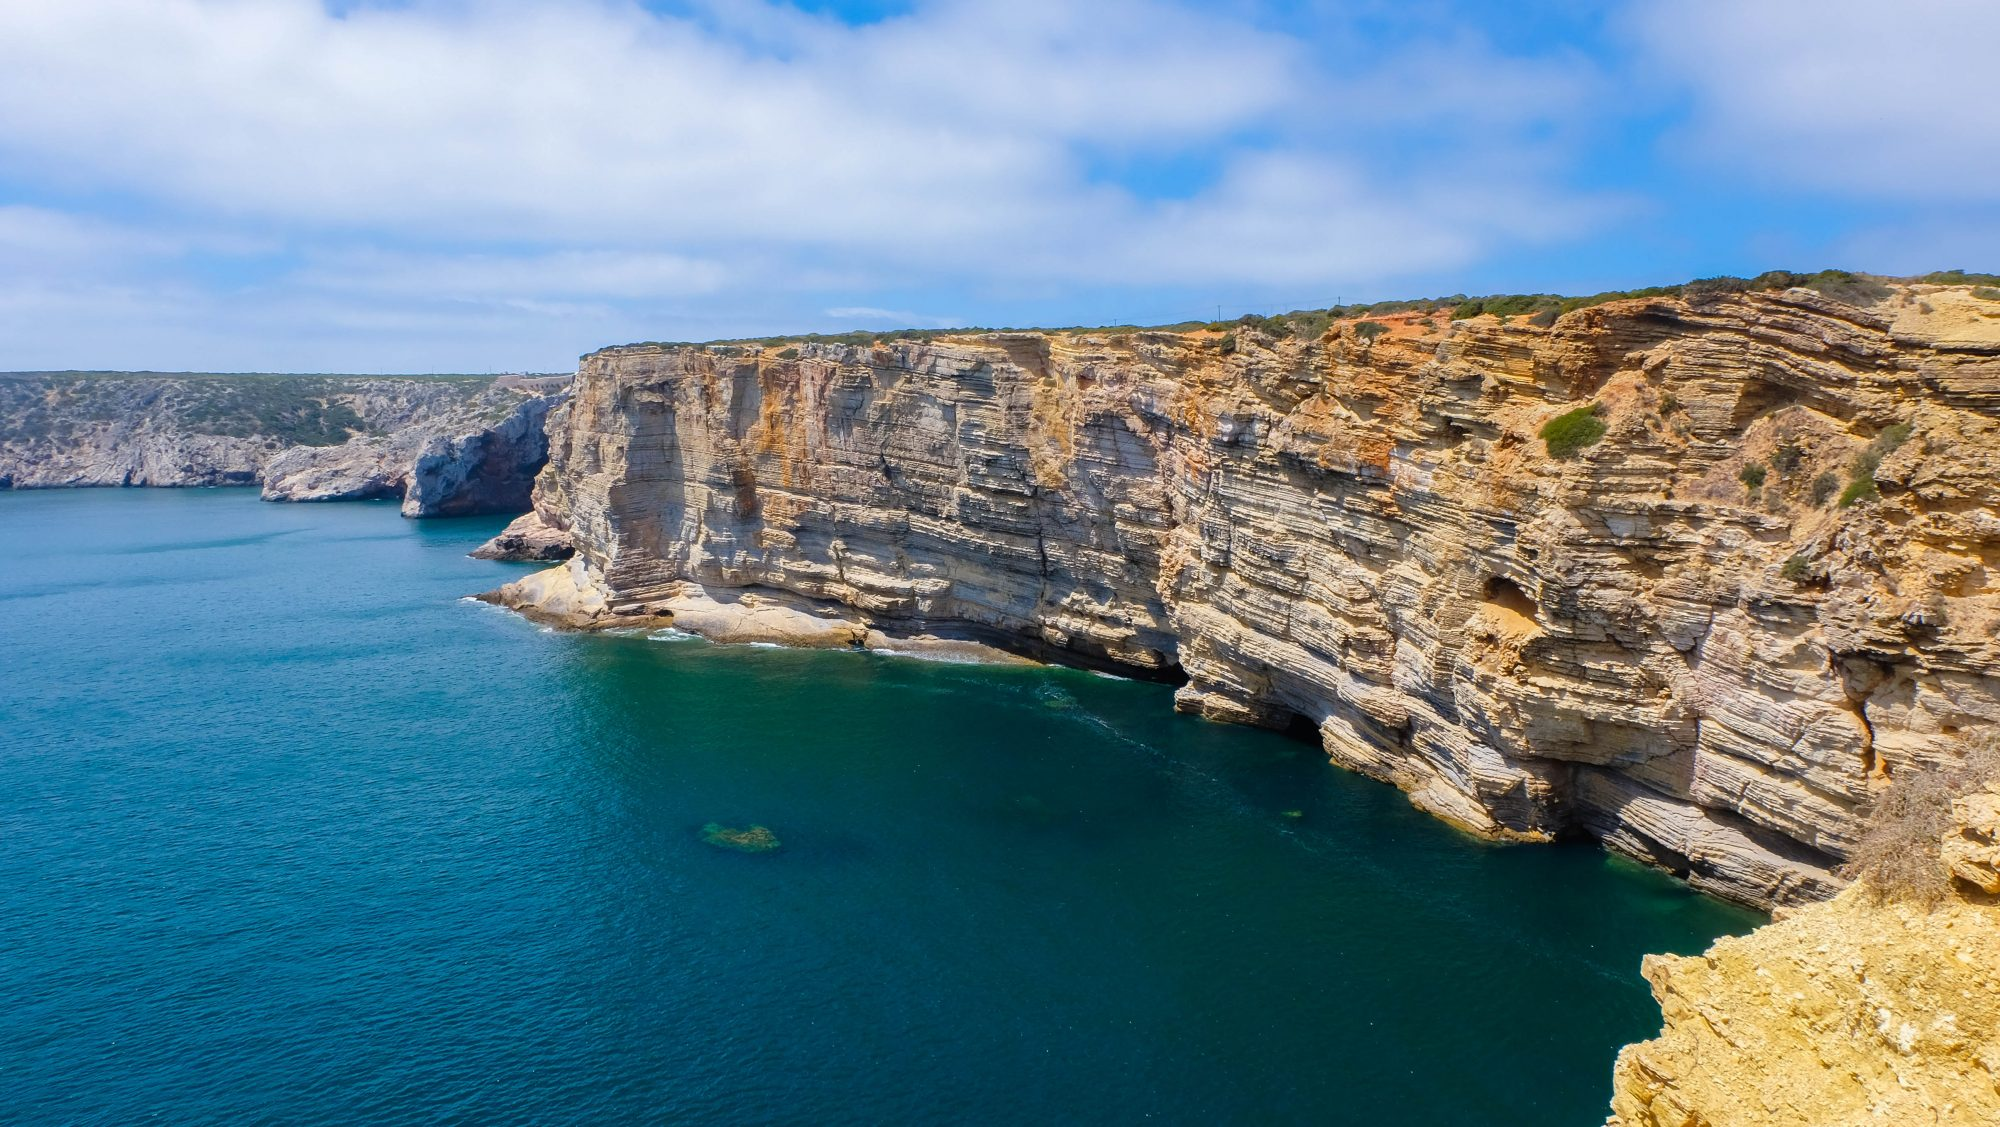 Les falaises - Sagres, Portugal